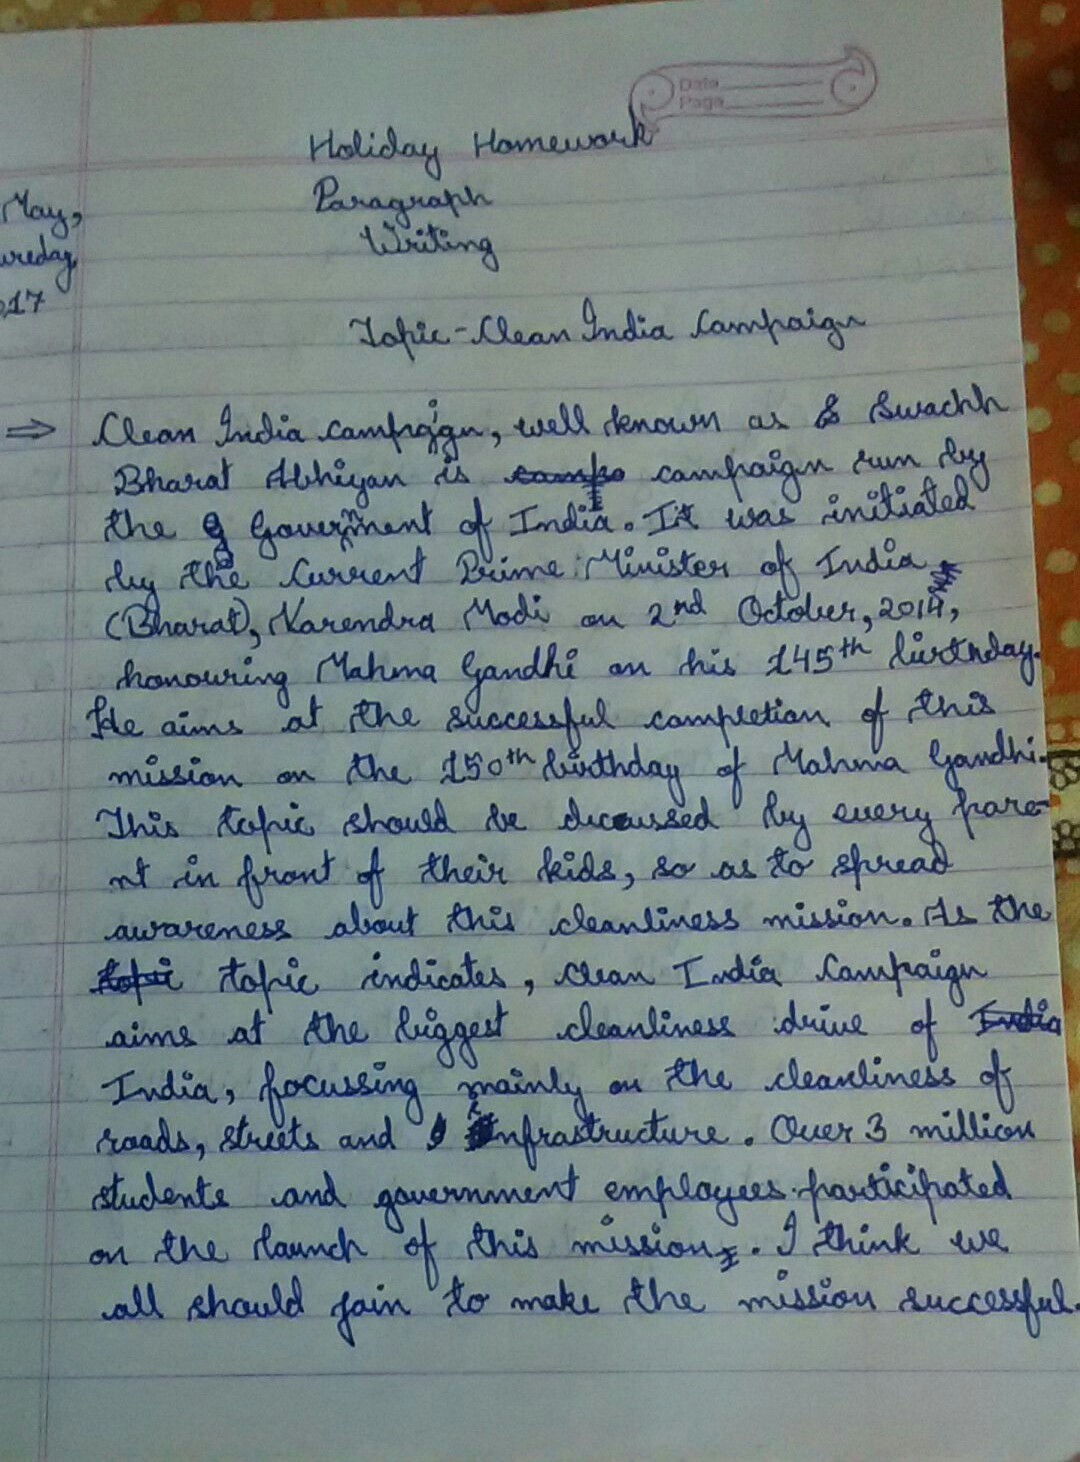 Swachh vidyalaya essay in english